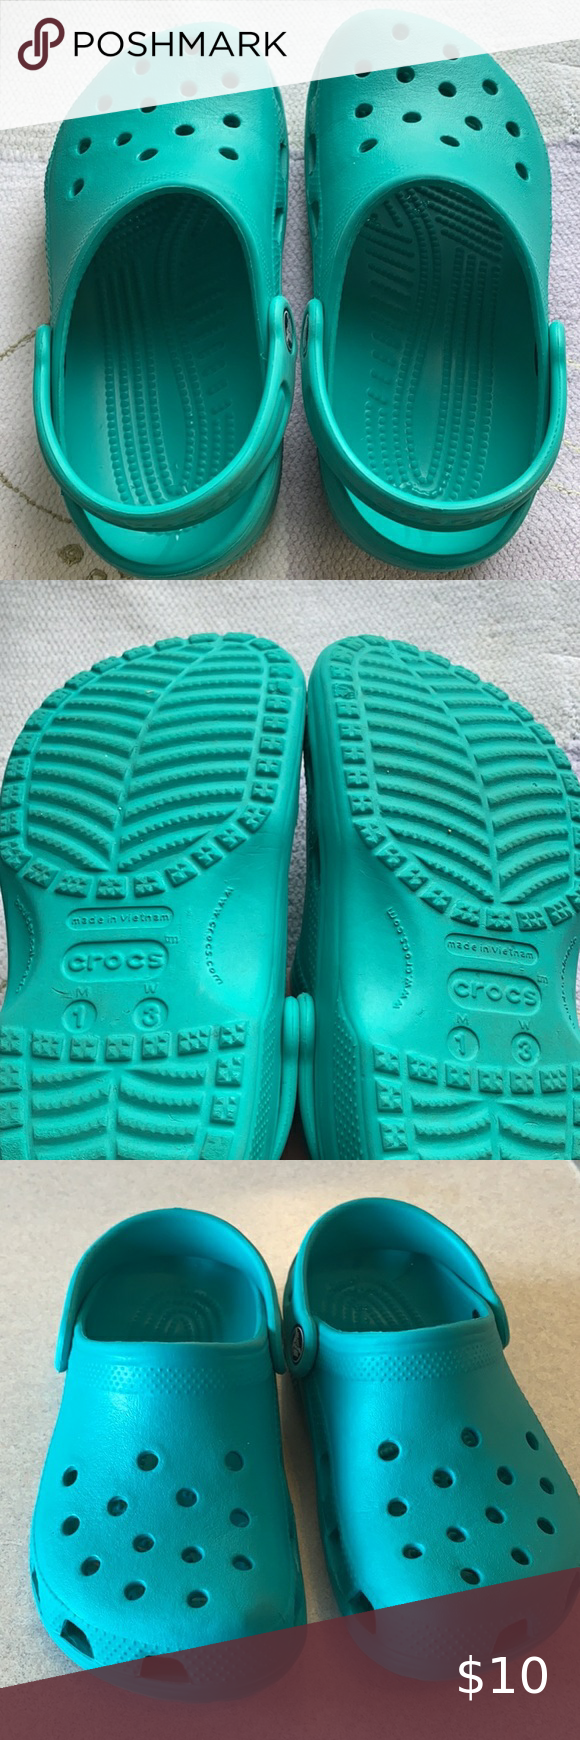 Crocs, Flip flop sandals, Crocs shoes